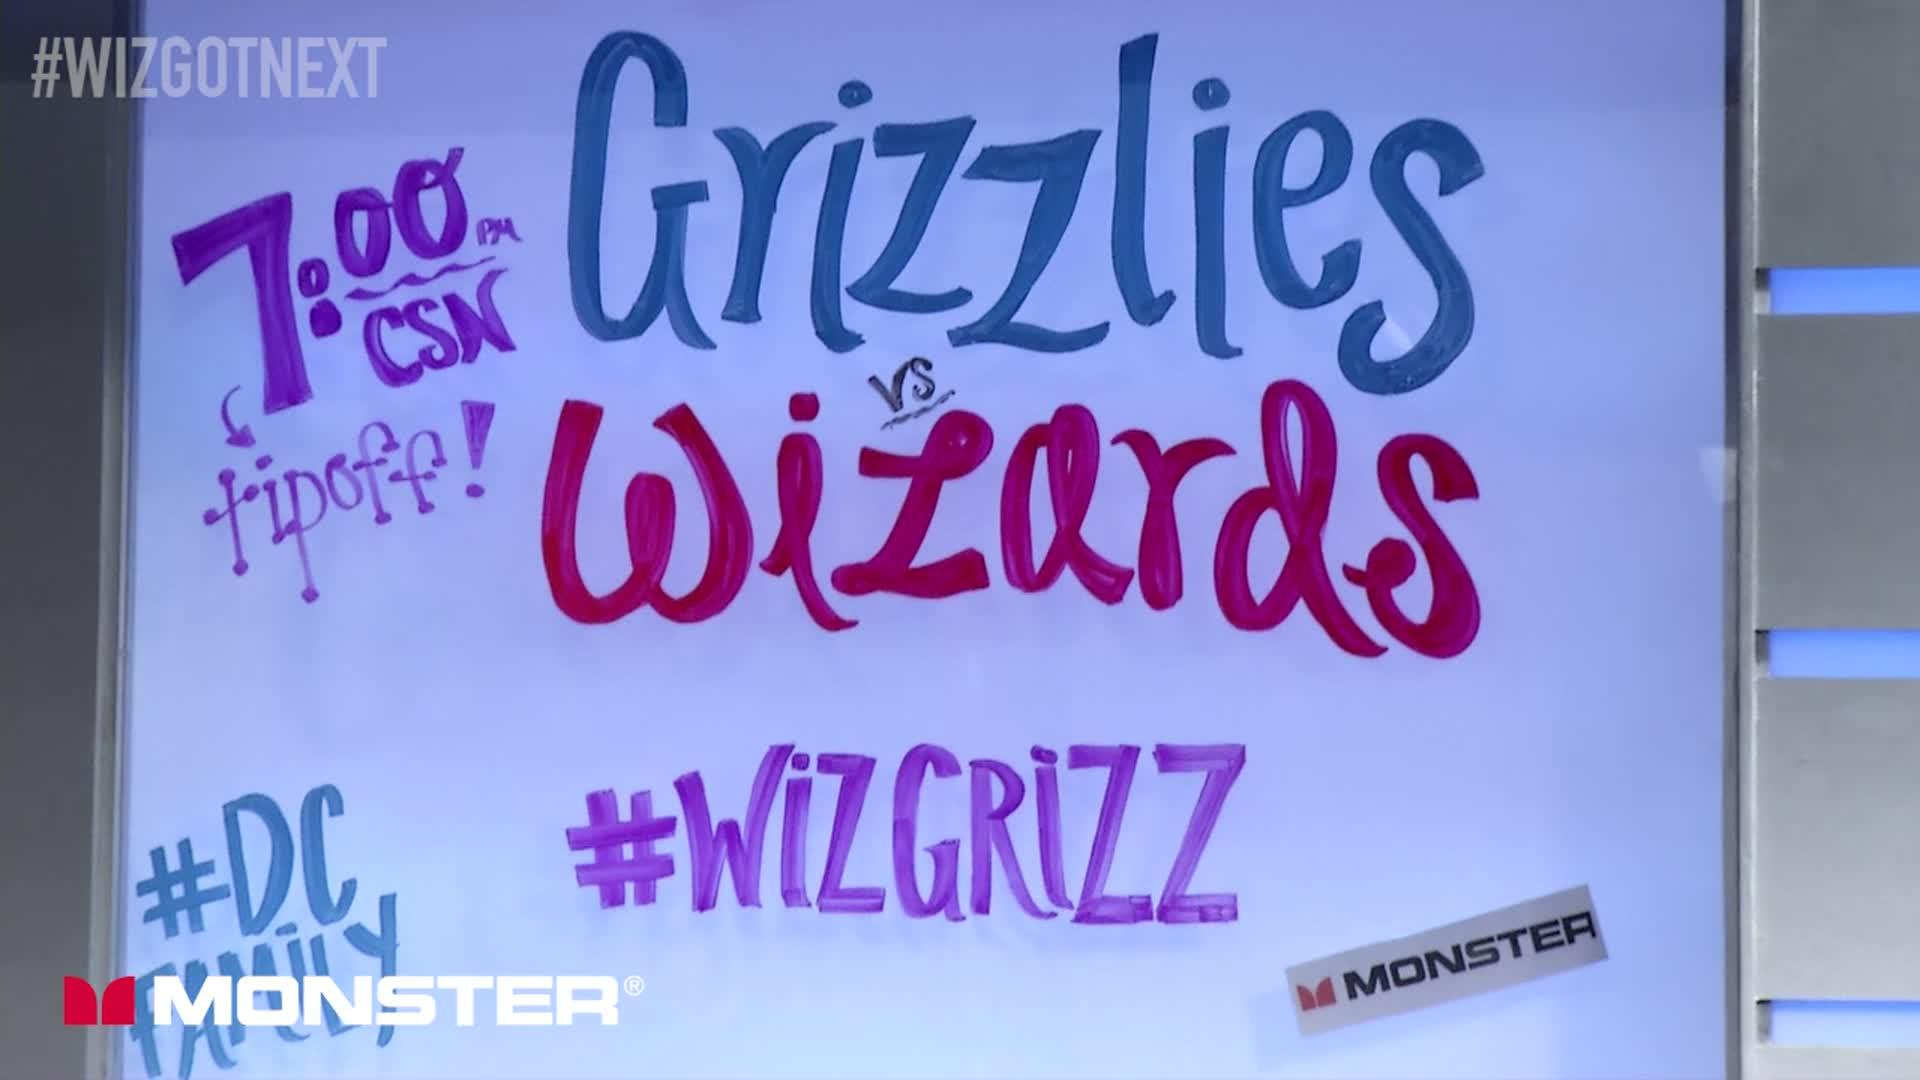 Wiz Got Next: Wizards vs Grizzlies Pt 3 - 1-18-17